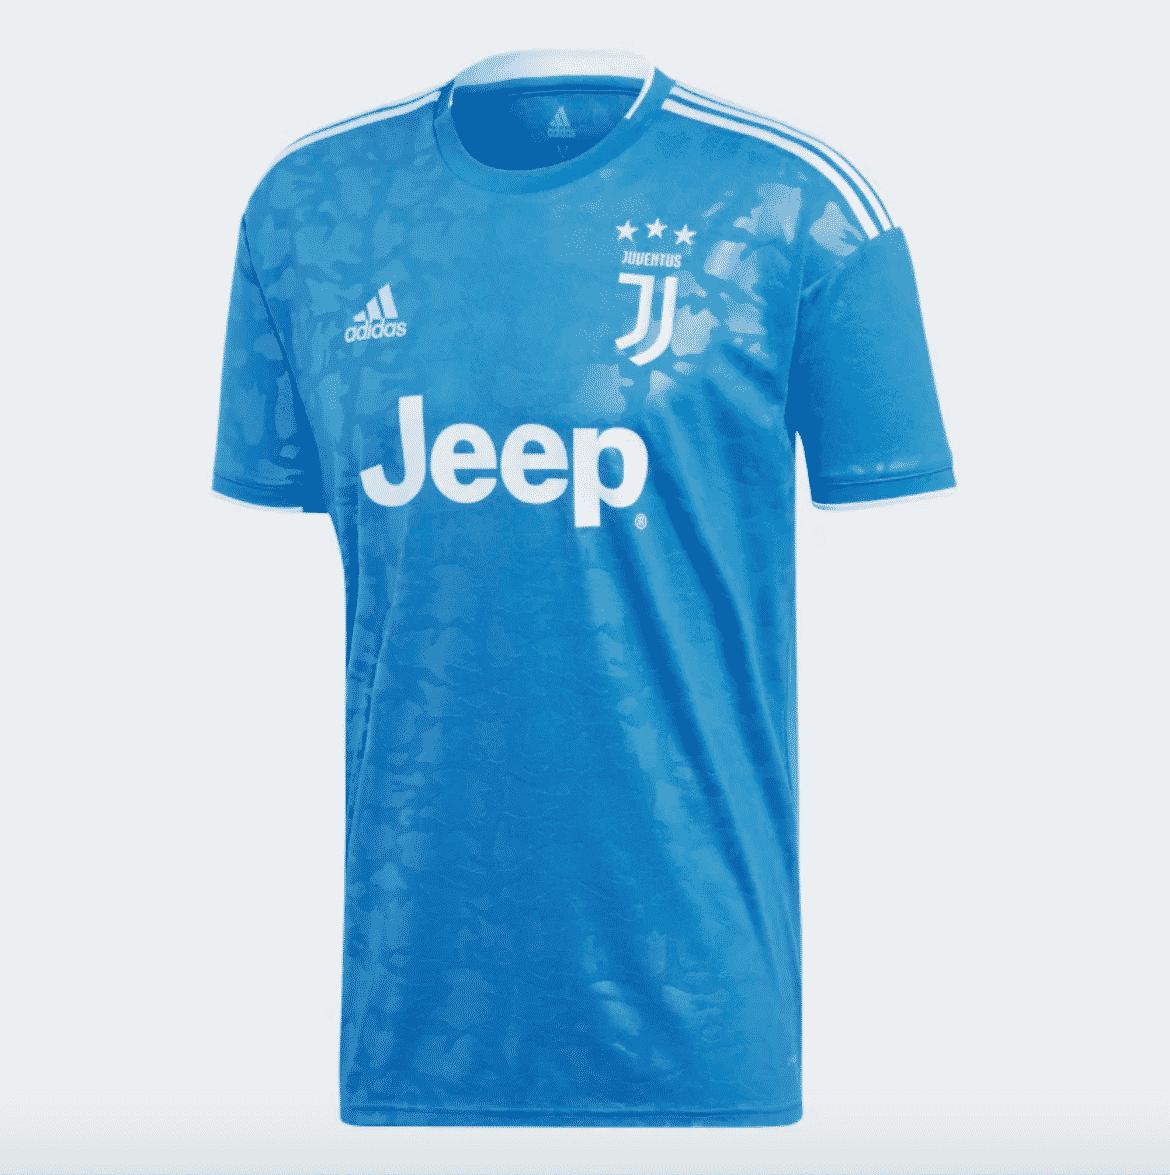 maillot-third-juventus-turin-2019-2020-adidas